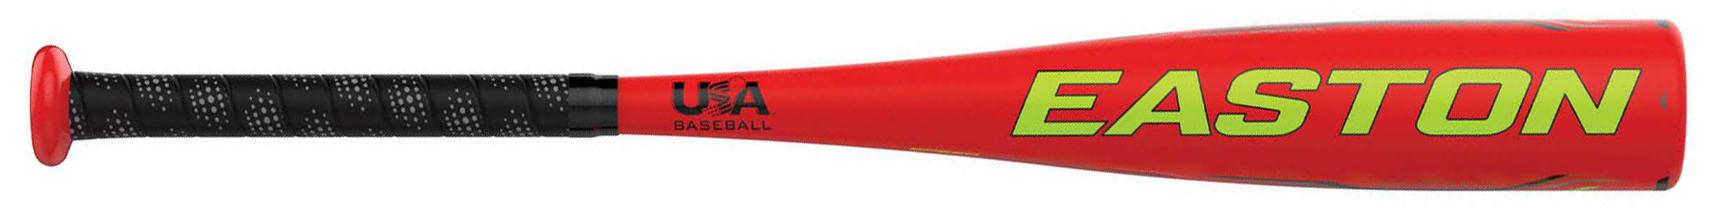 Easton Ghost X Hyperlite -13 USA Kids Tee Ball Baseball